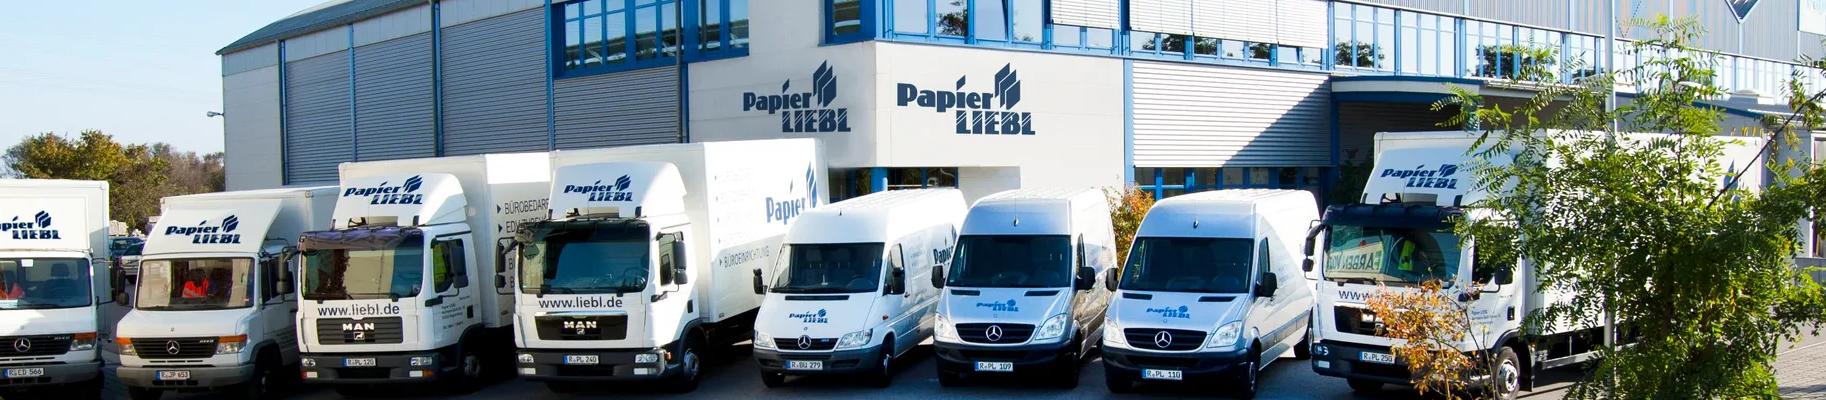 Papier LIEBL GmbH